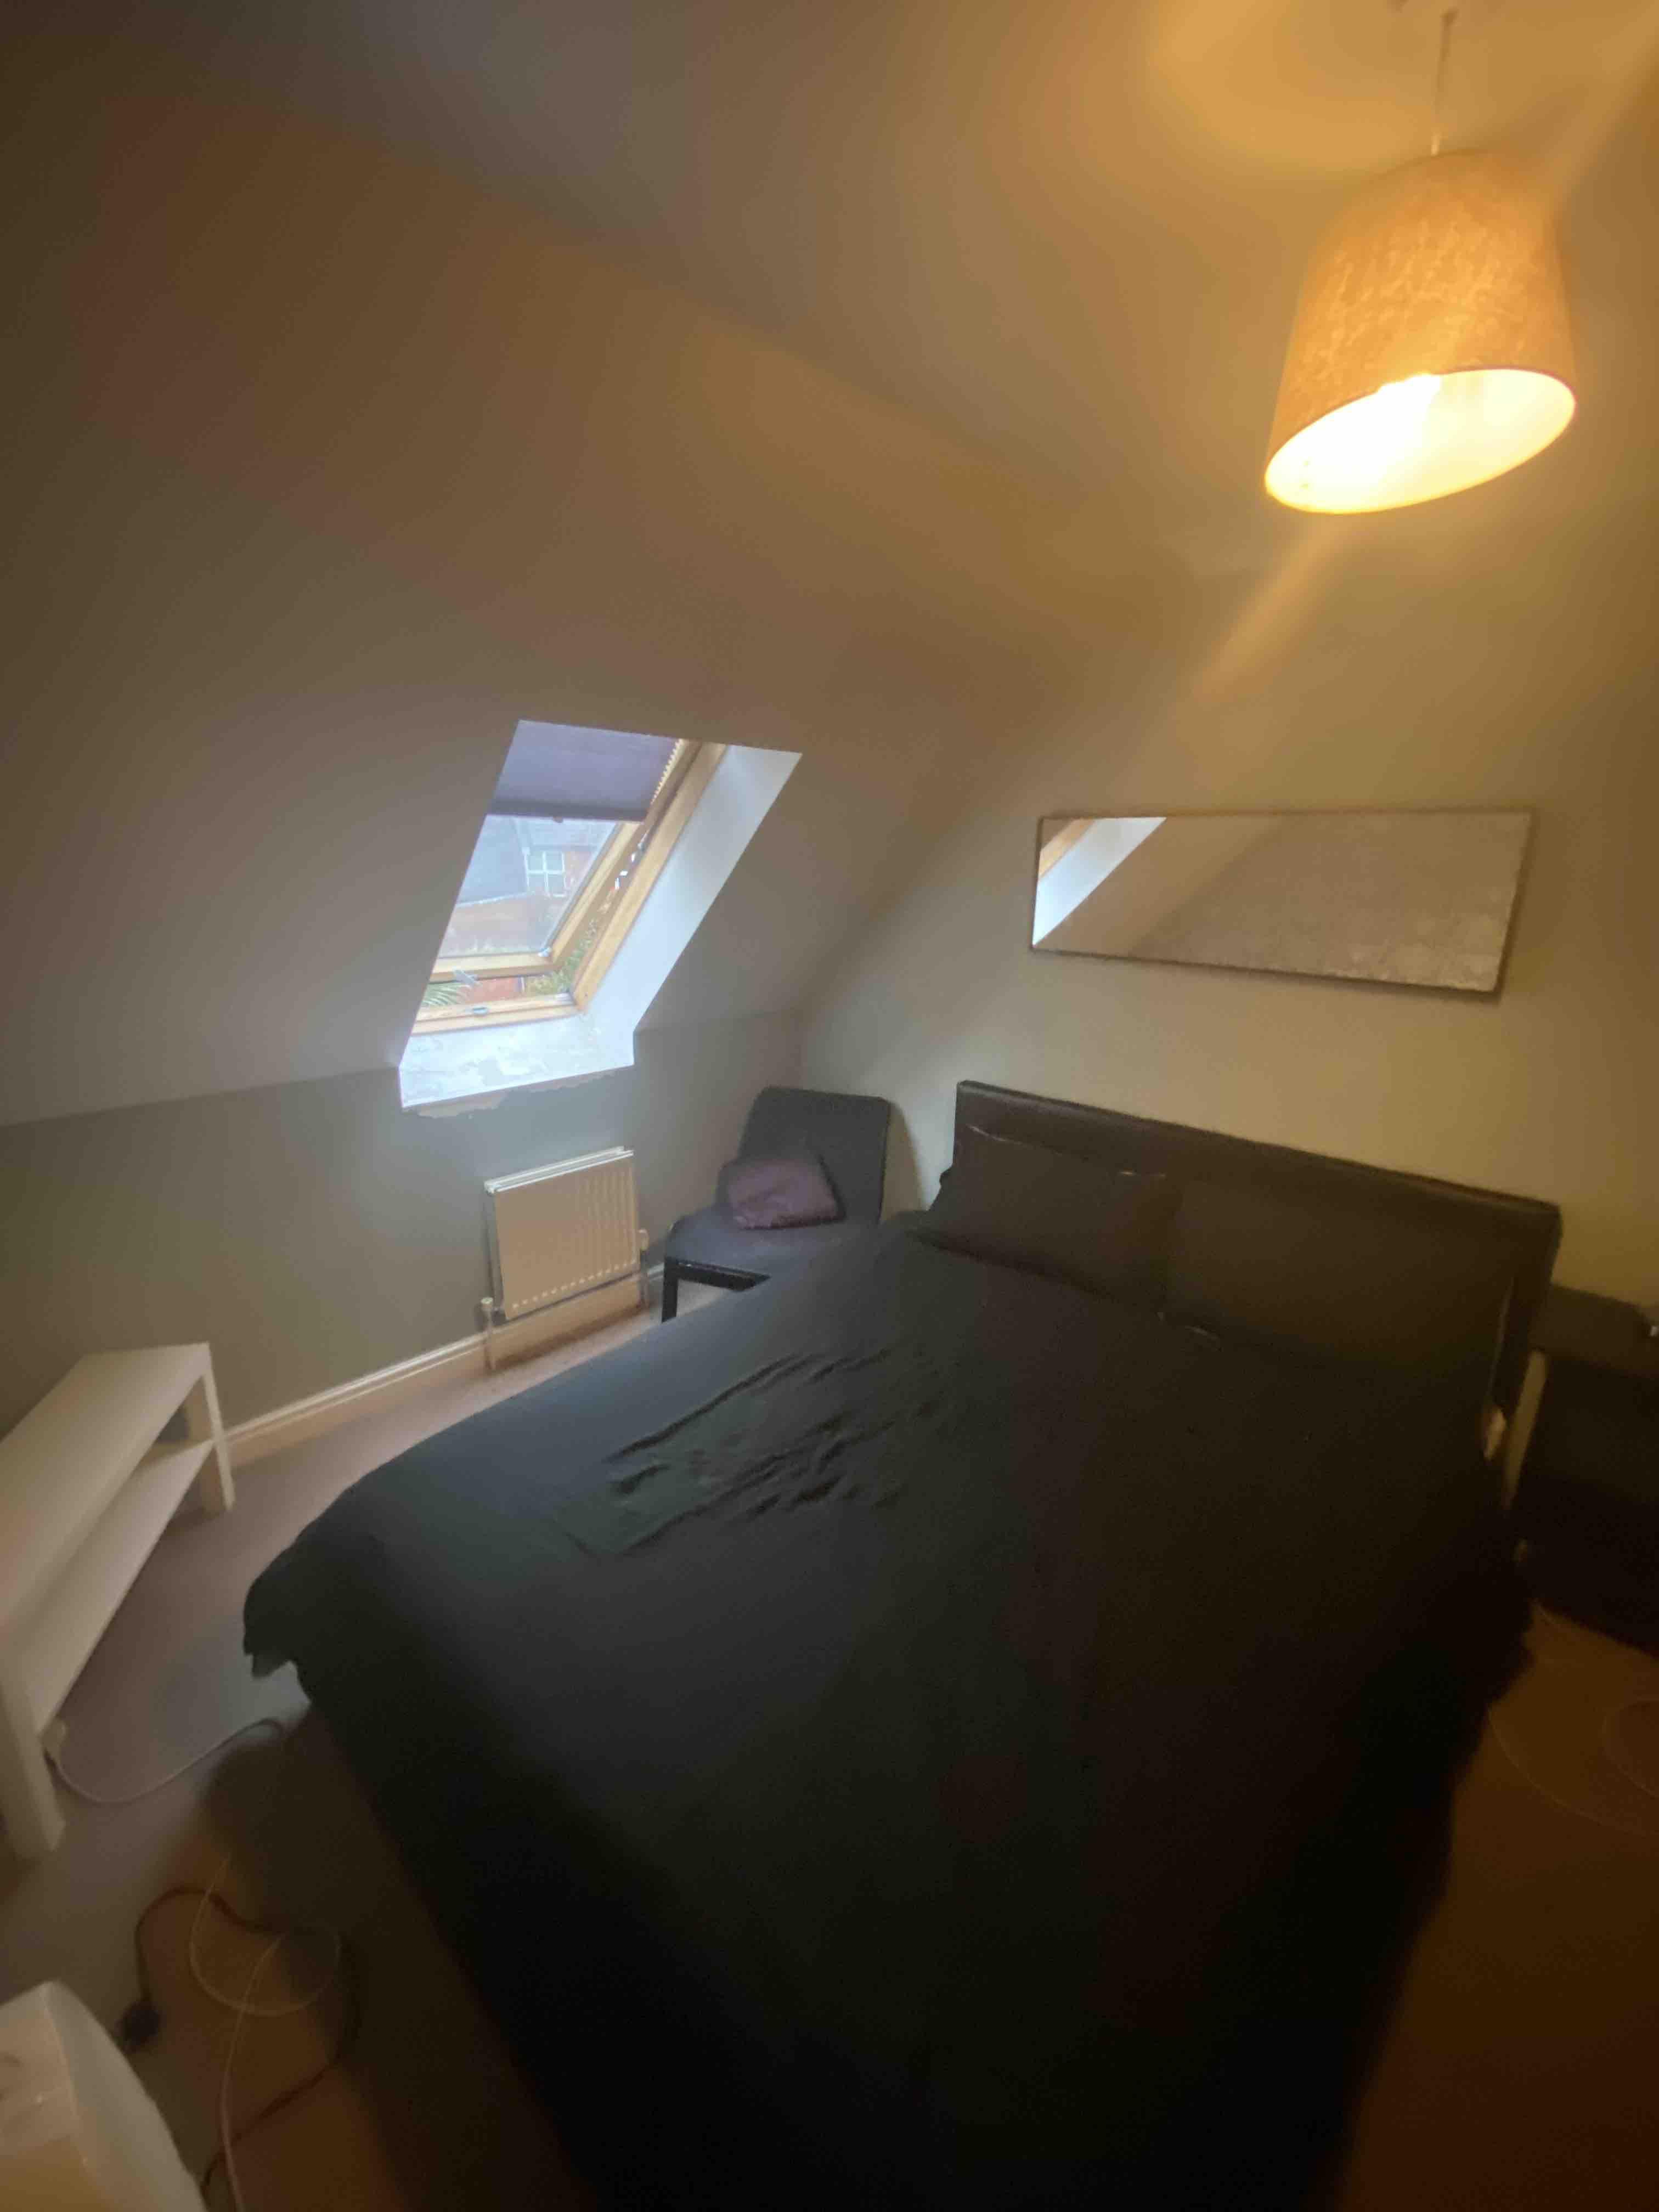 1 room in Woolstone, Milton Keynes, MK109PF RoomsLocal image